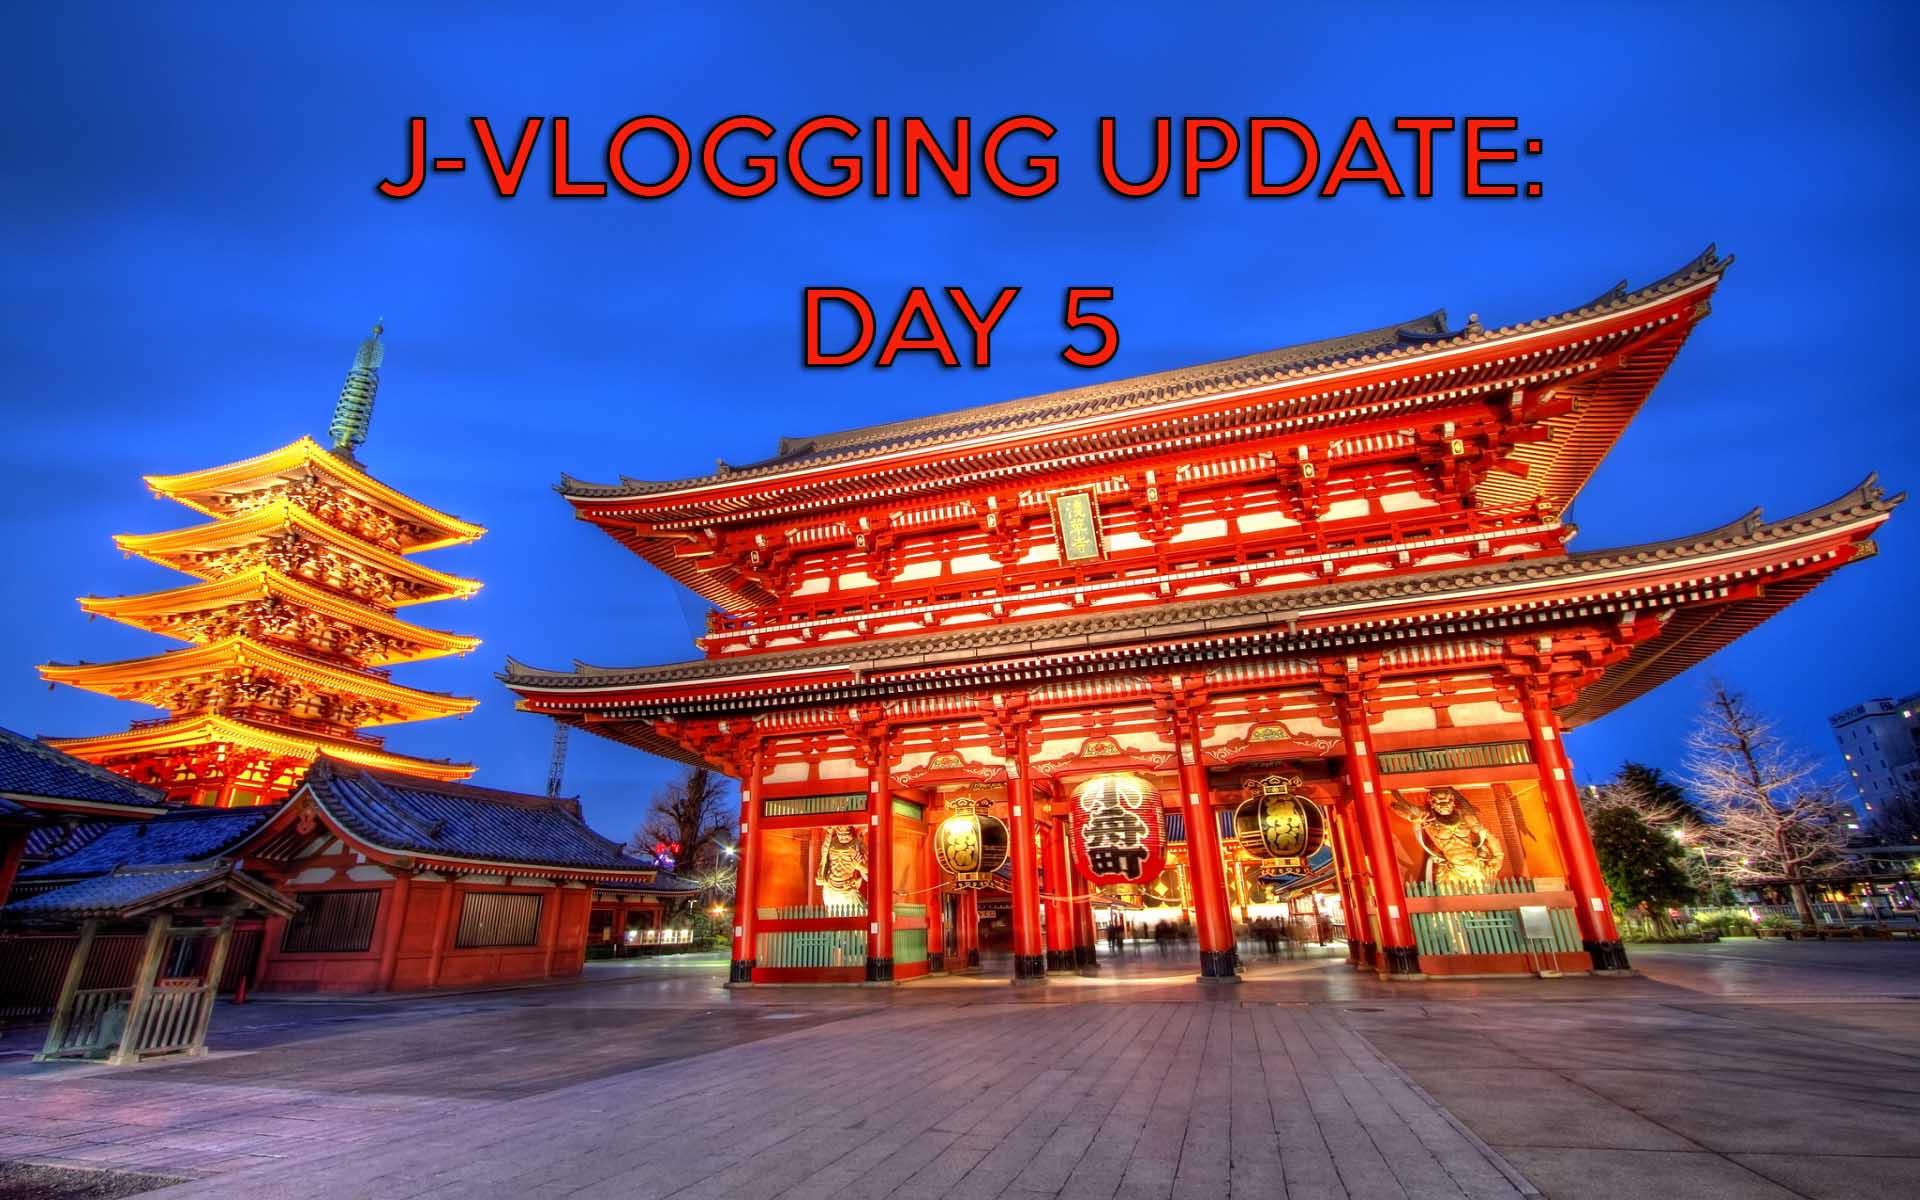 ASAKUSA & SENSO-JI TEMPLE: J-VLOGGING 2016 DAY 5